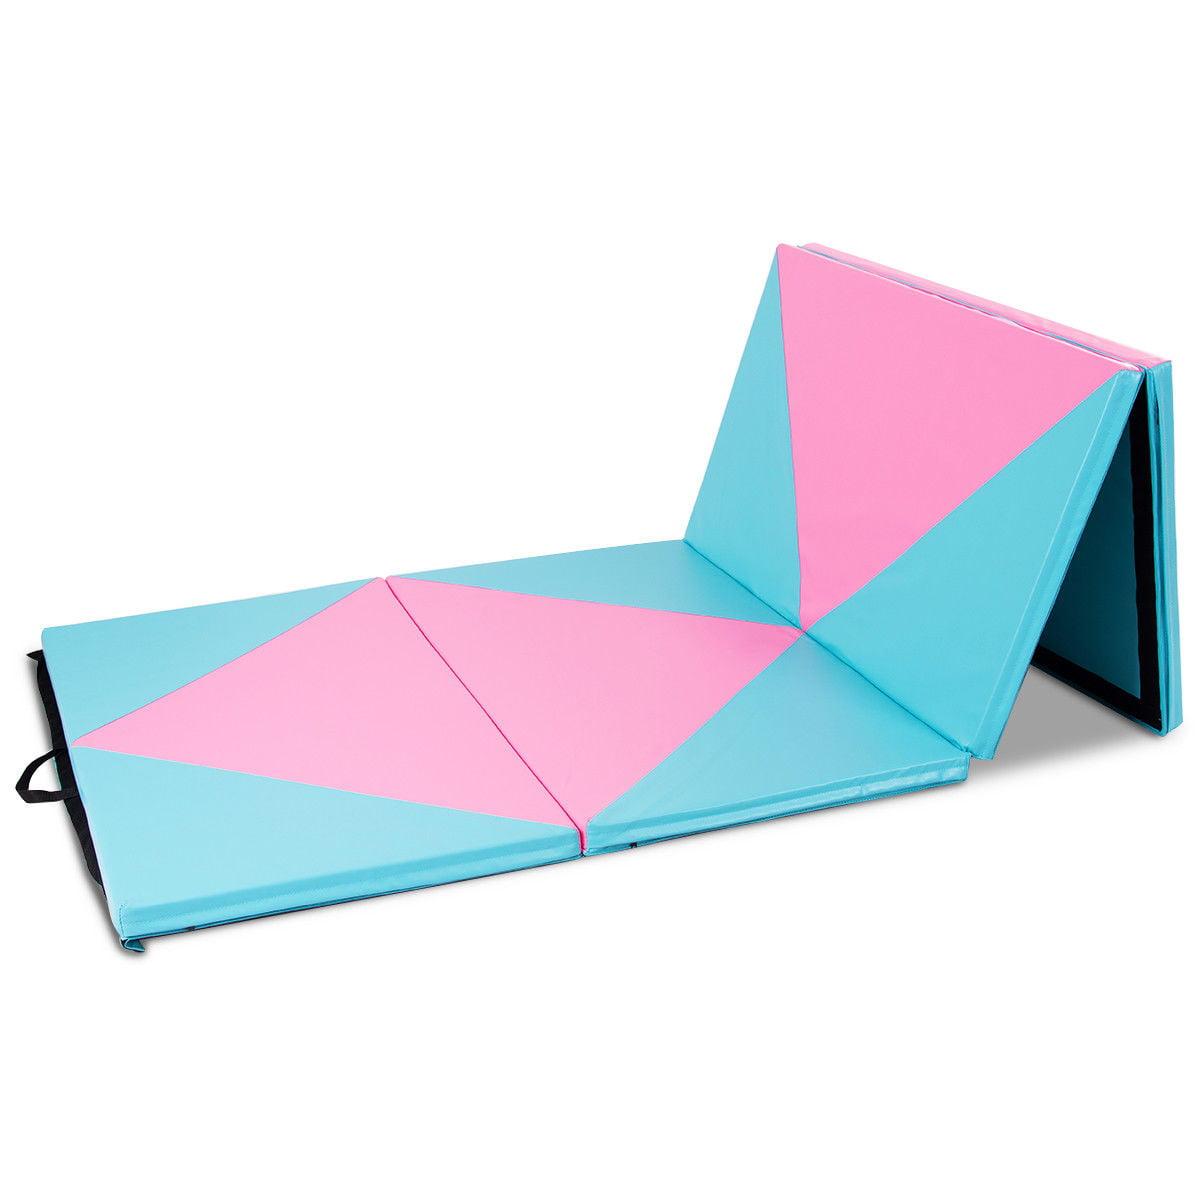 Goplus 4 X10 X2 Thick Folding Panel Gymnastics Mat Gym